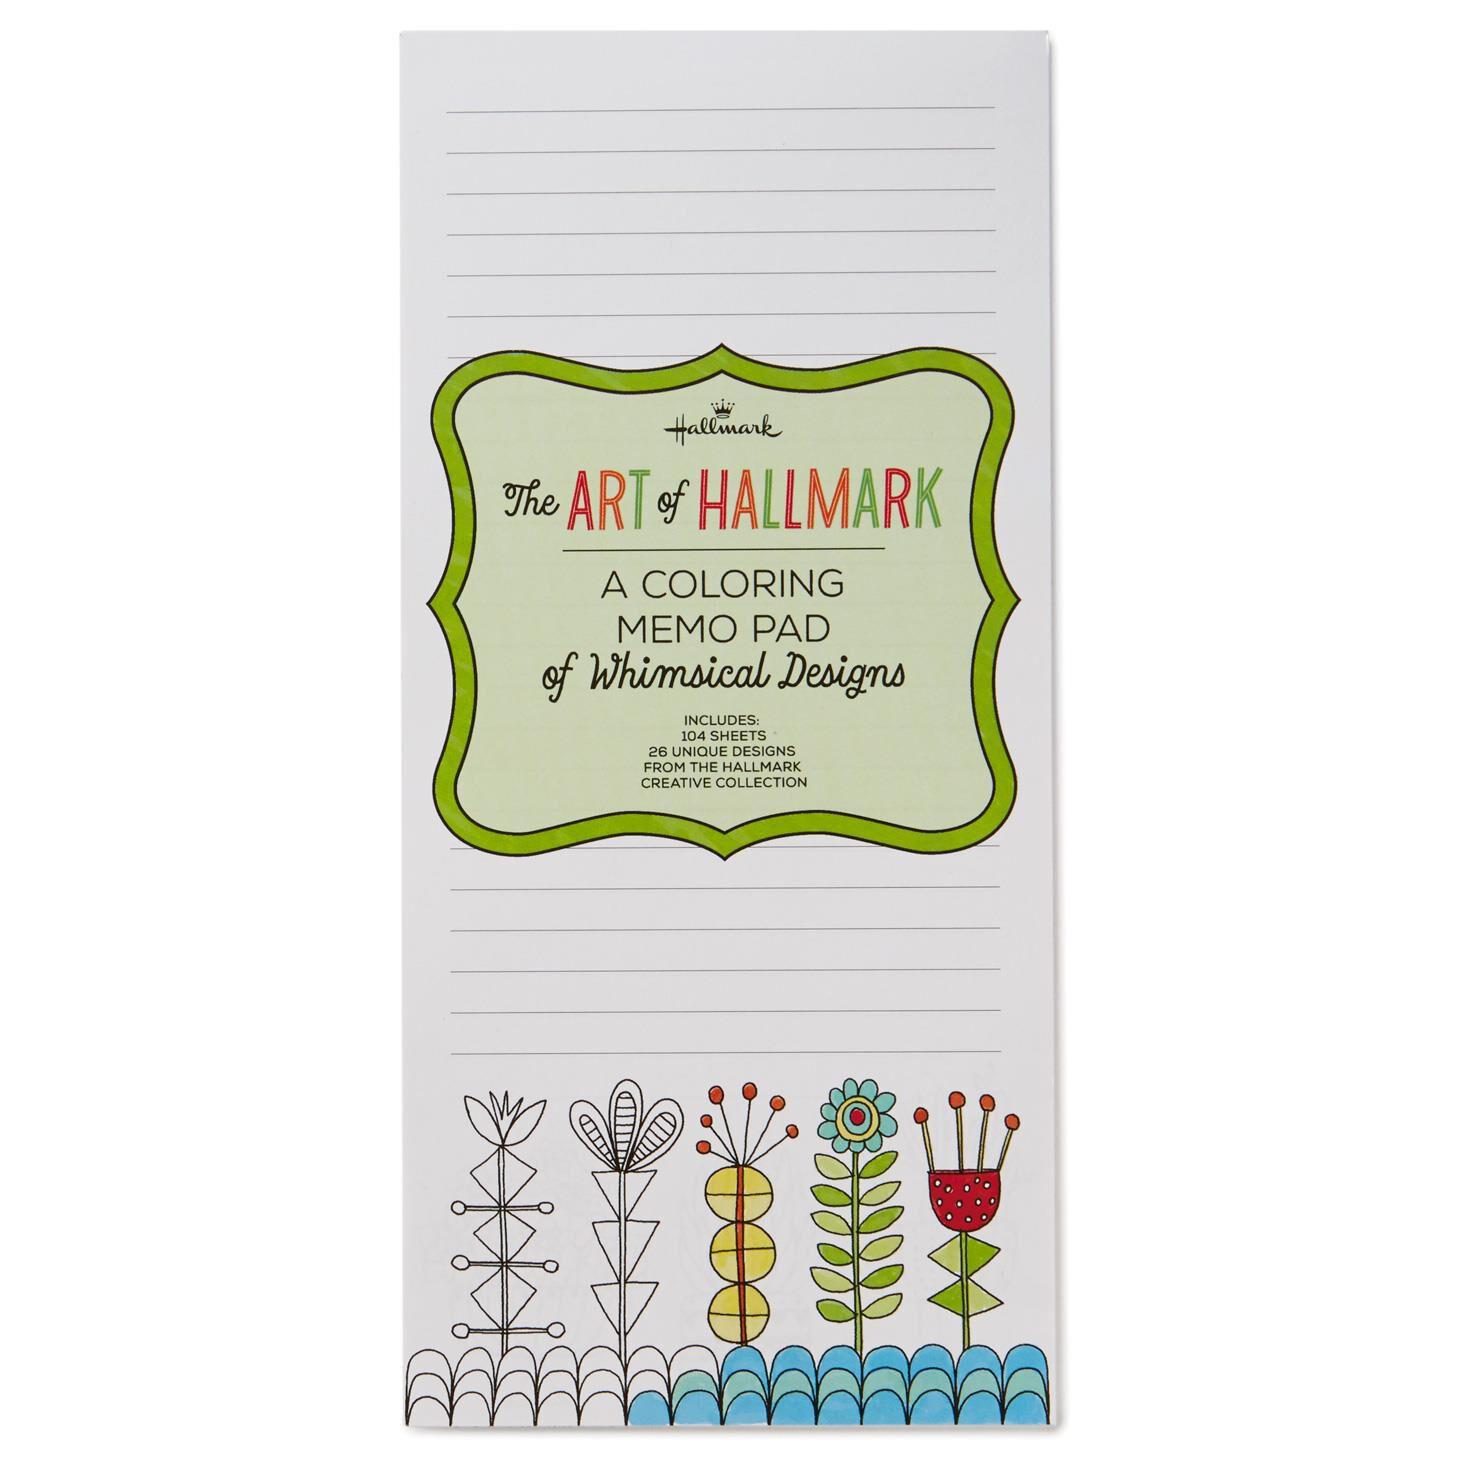 a coloring memo pad of whimsical designs memo pads hallmark